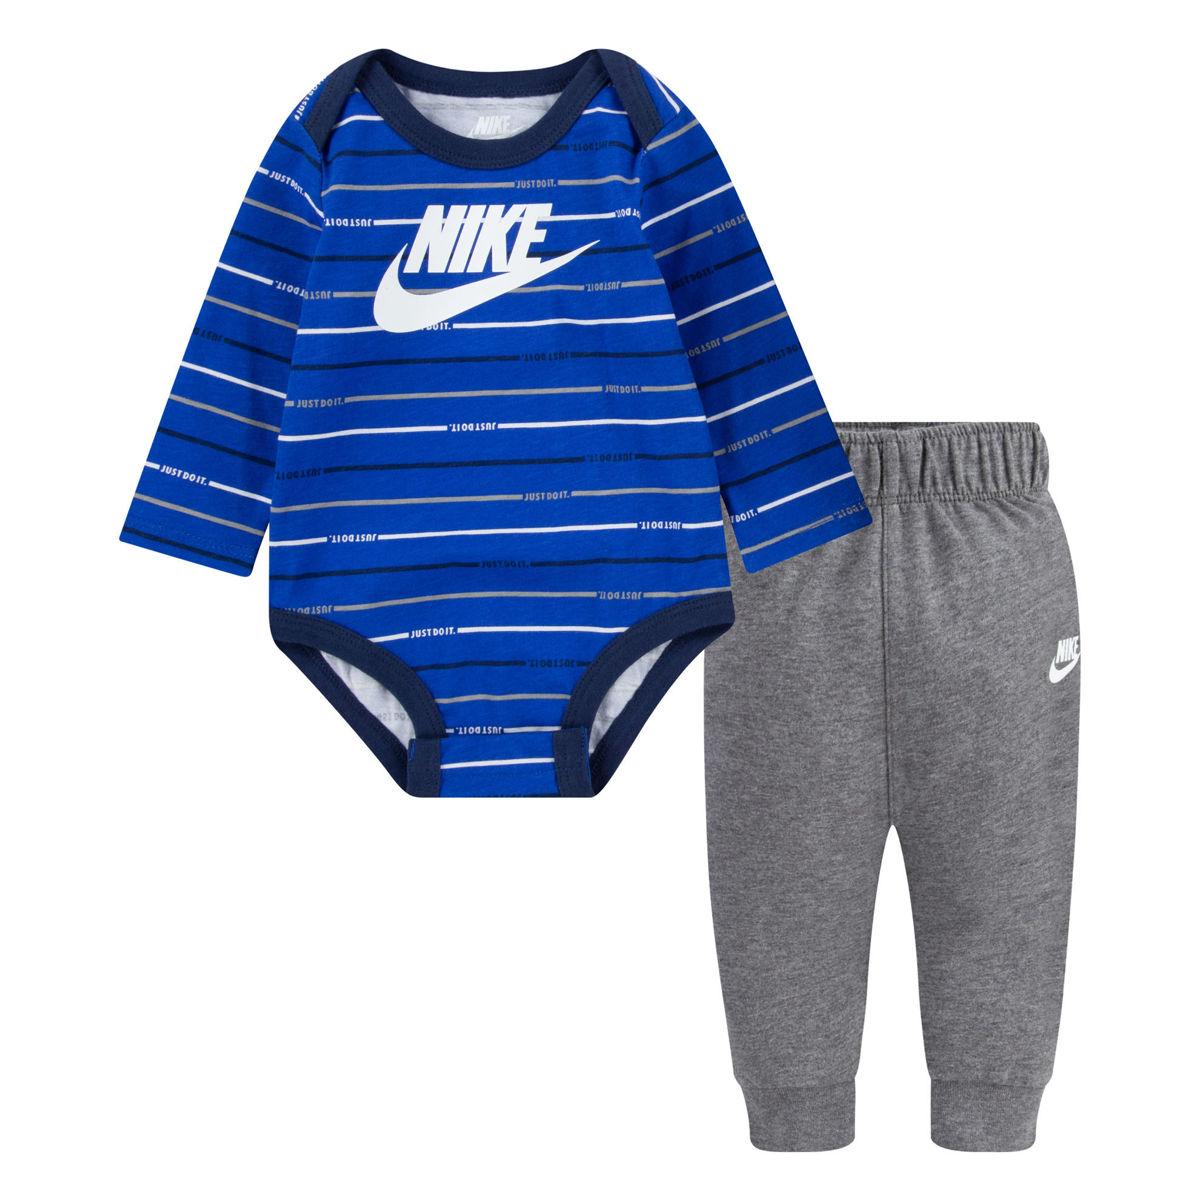 Bilde av Nike baby boy bodysuit 56H032-GEH